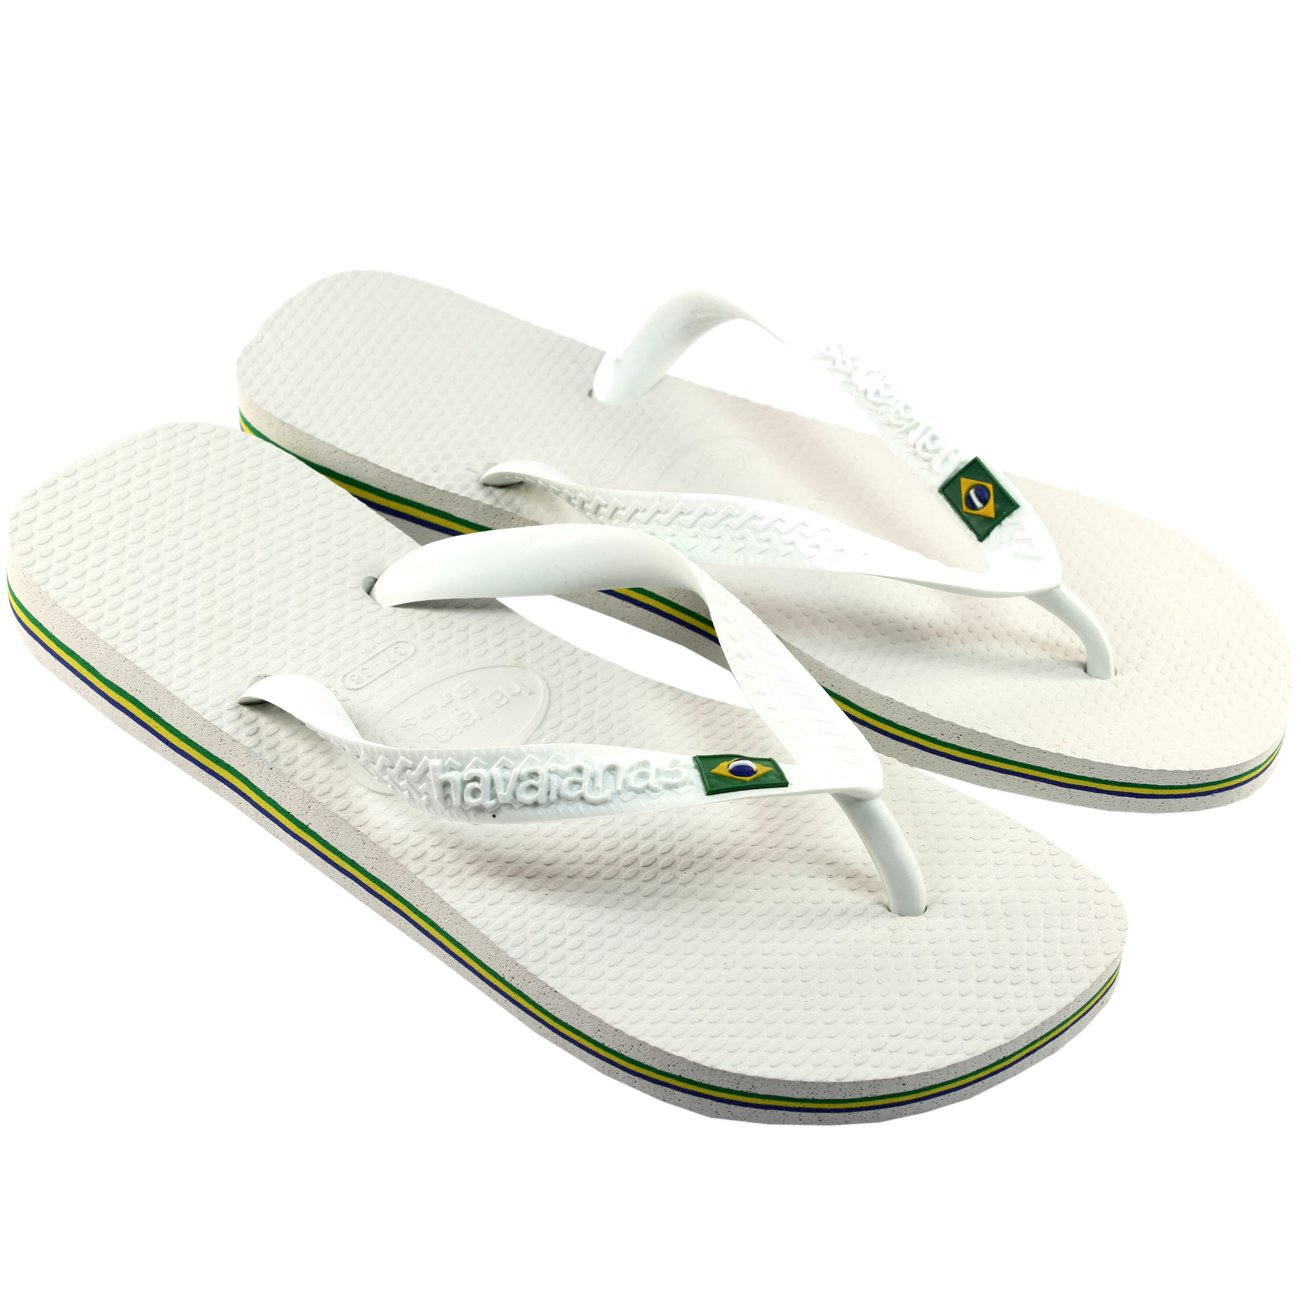 Herren Sandalen Havaianas Brasil Flip Flop Sandals  35/36 EU Wei?